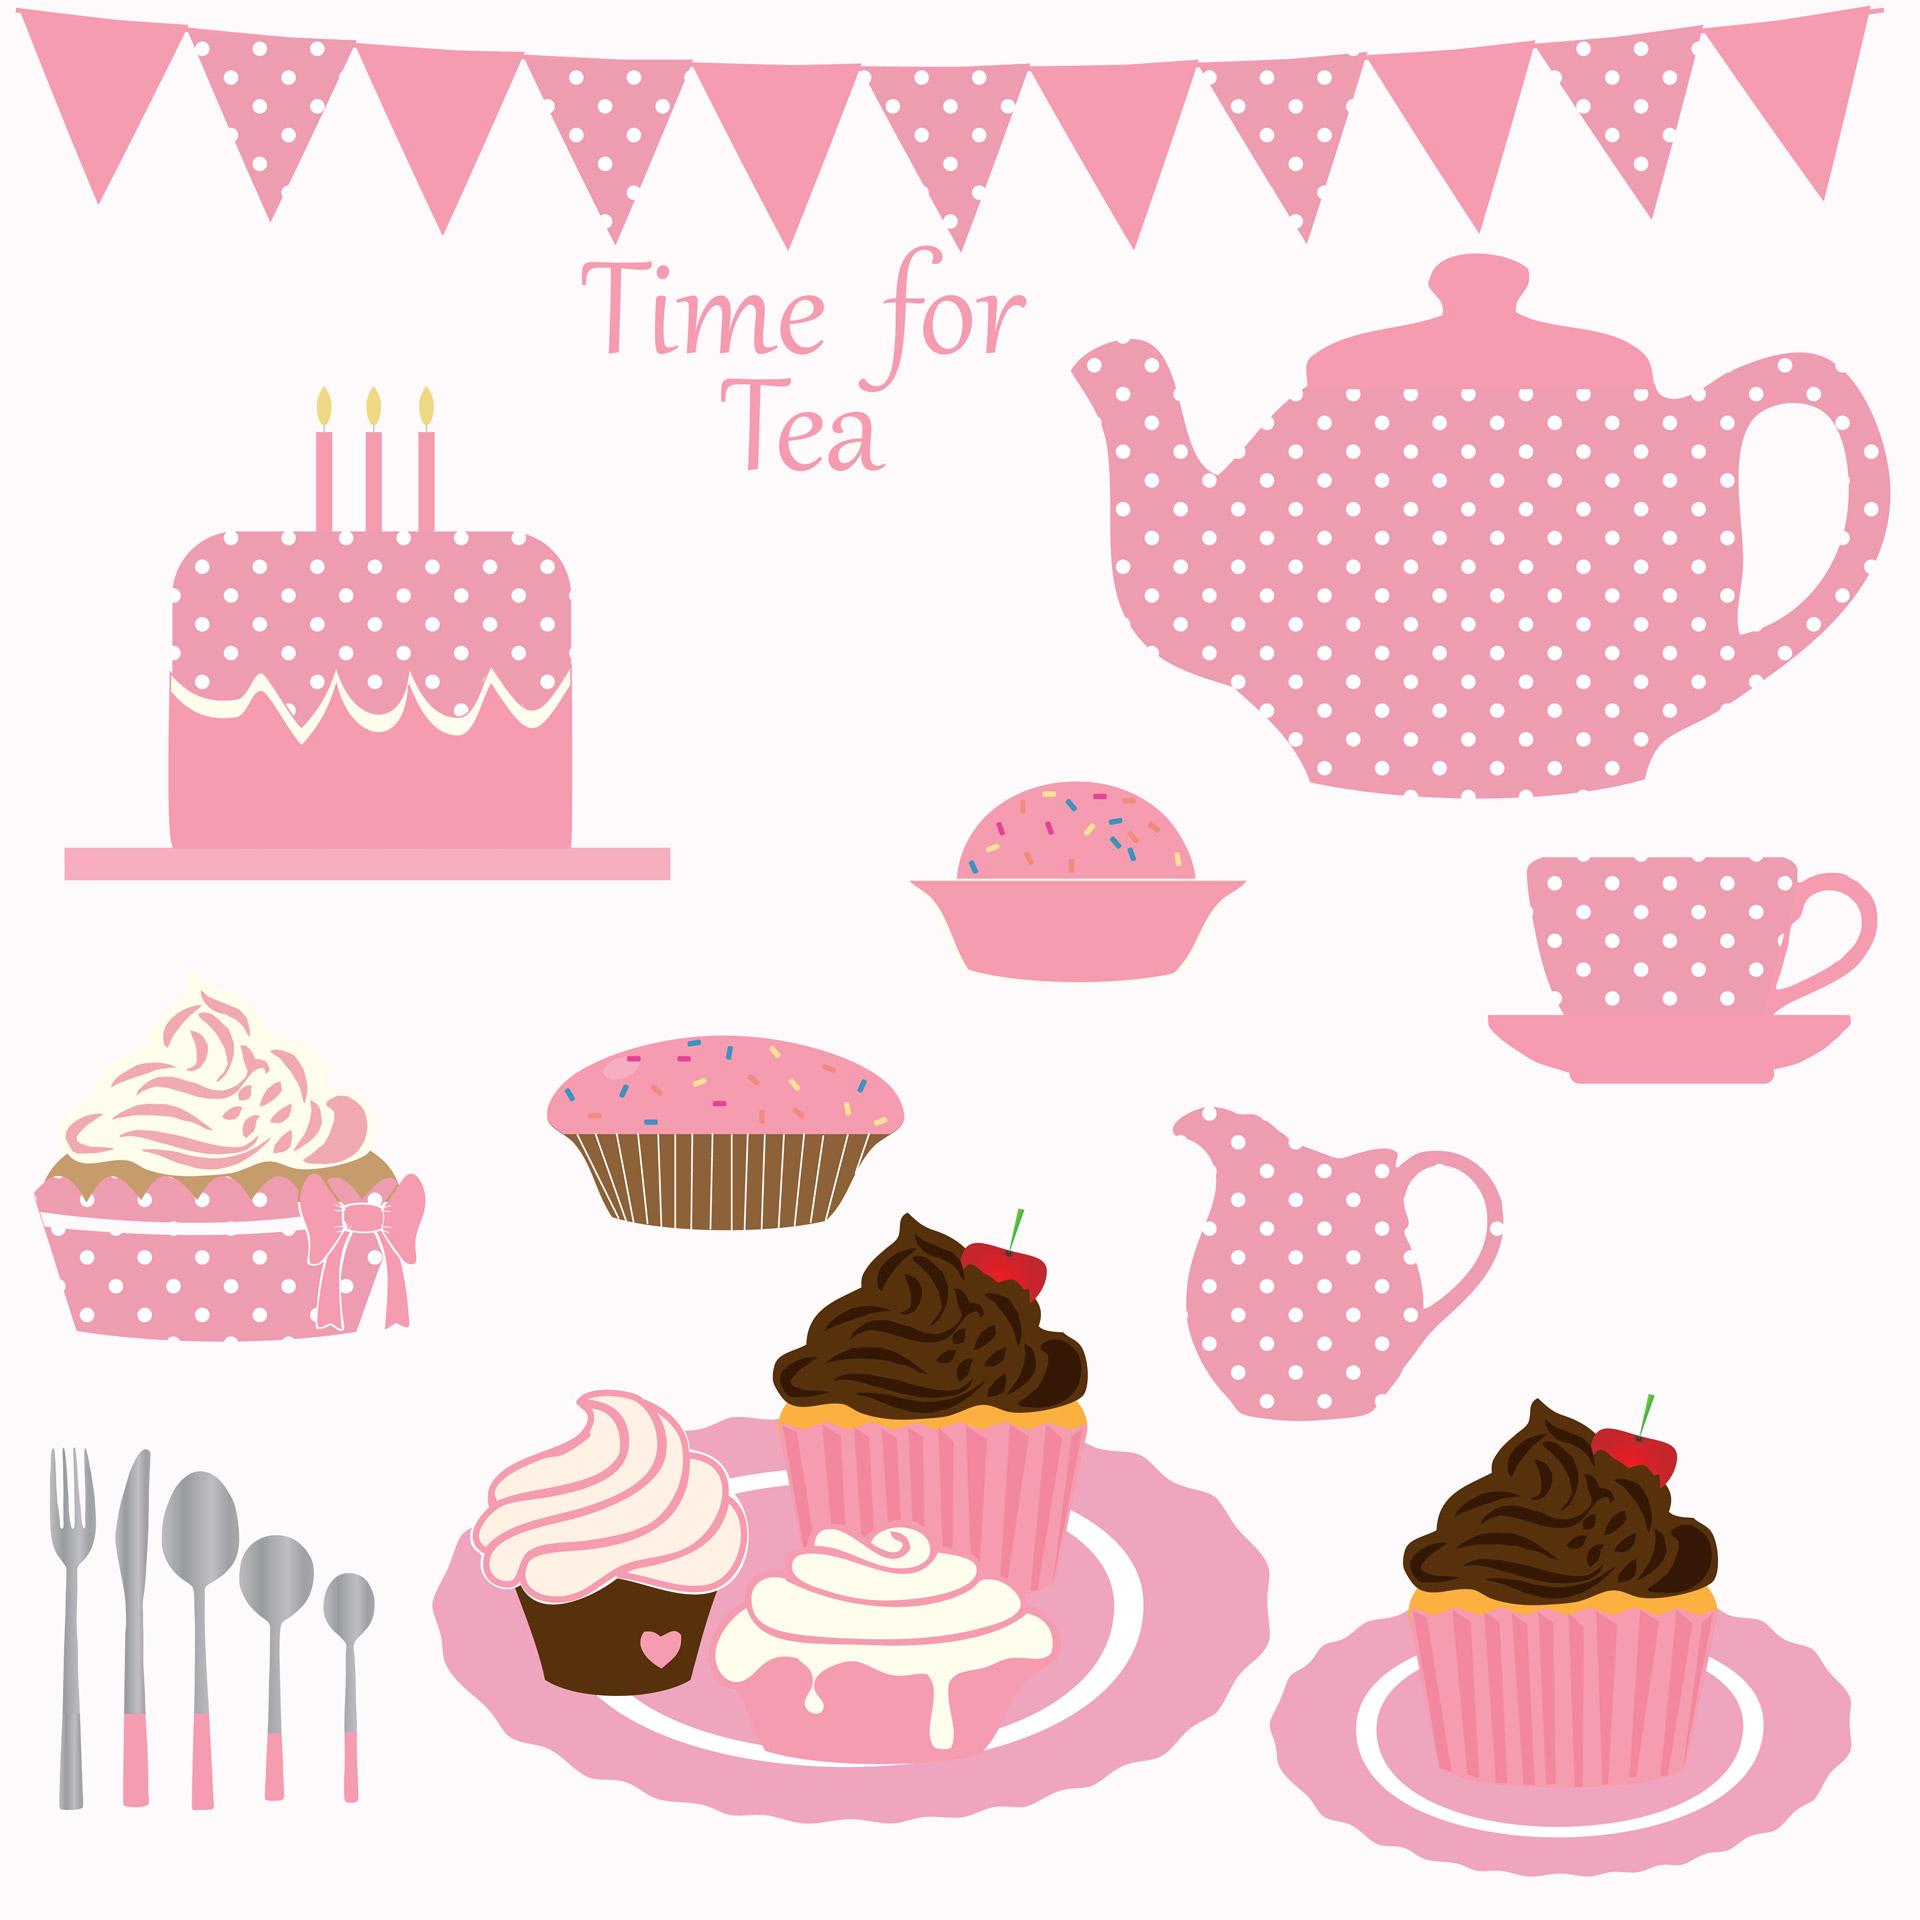 Cupcake Invitations Free is awesome invitation ideas